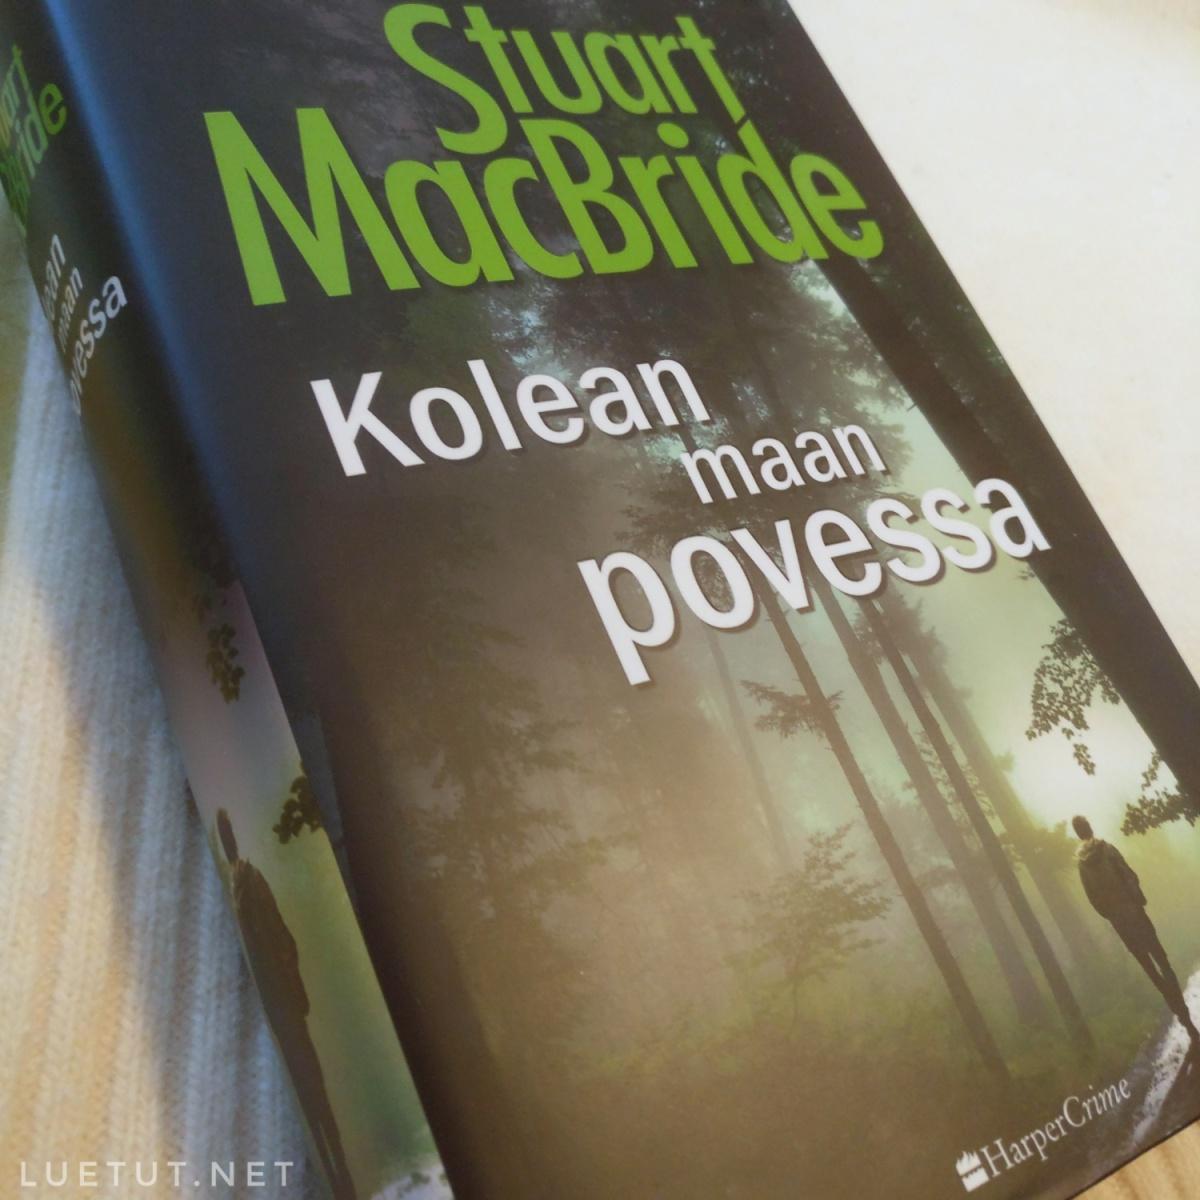 Stuart MacBride: Kolean maan povessa